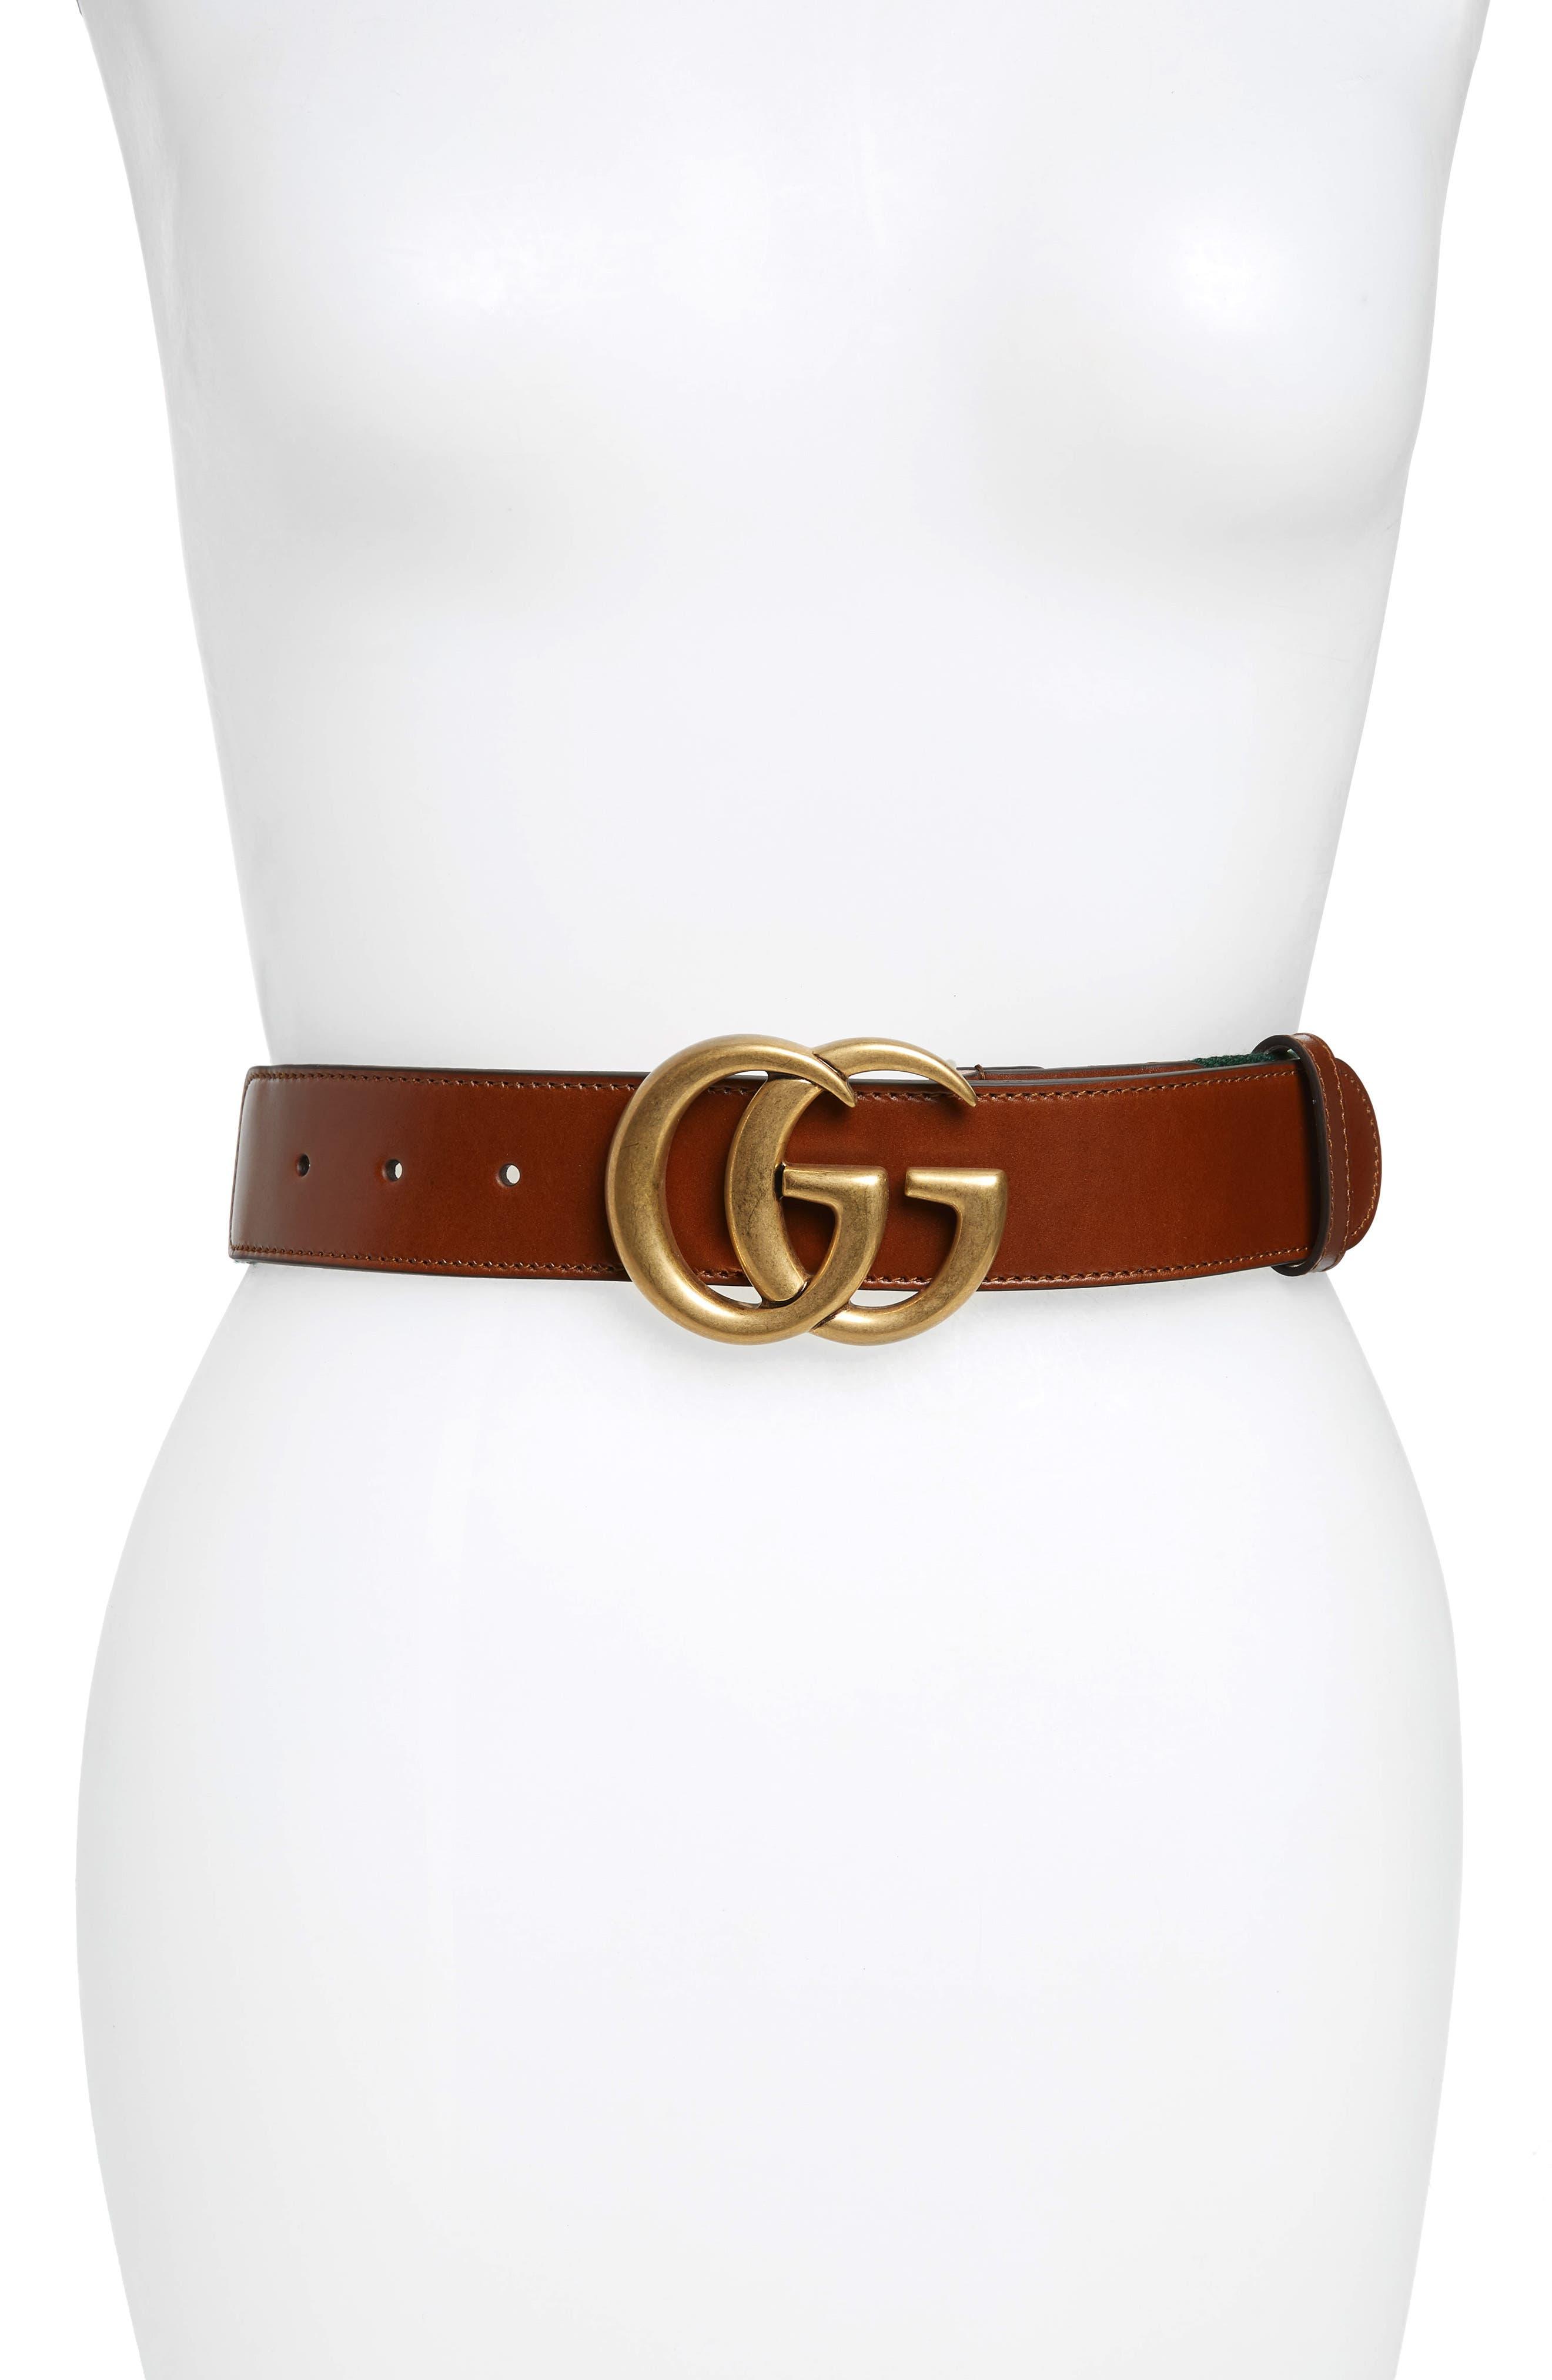 GUCCI, GG Logo Leather Belt, Main thumbnail 1, color, CUIR/VRV